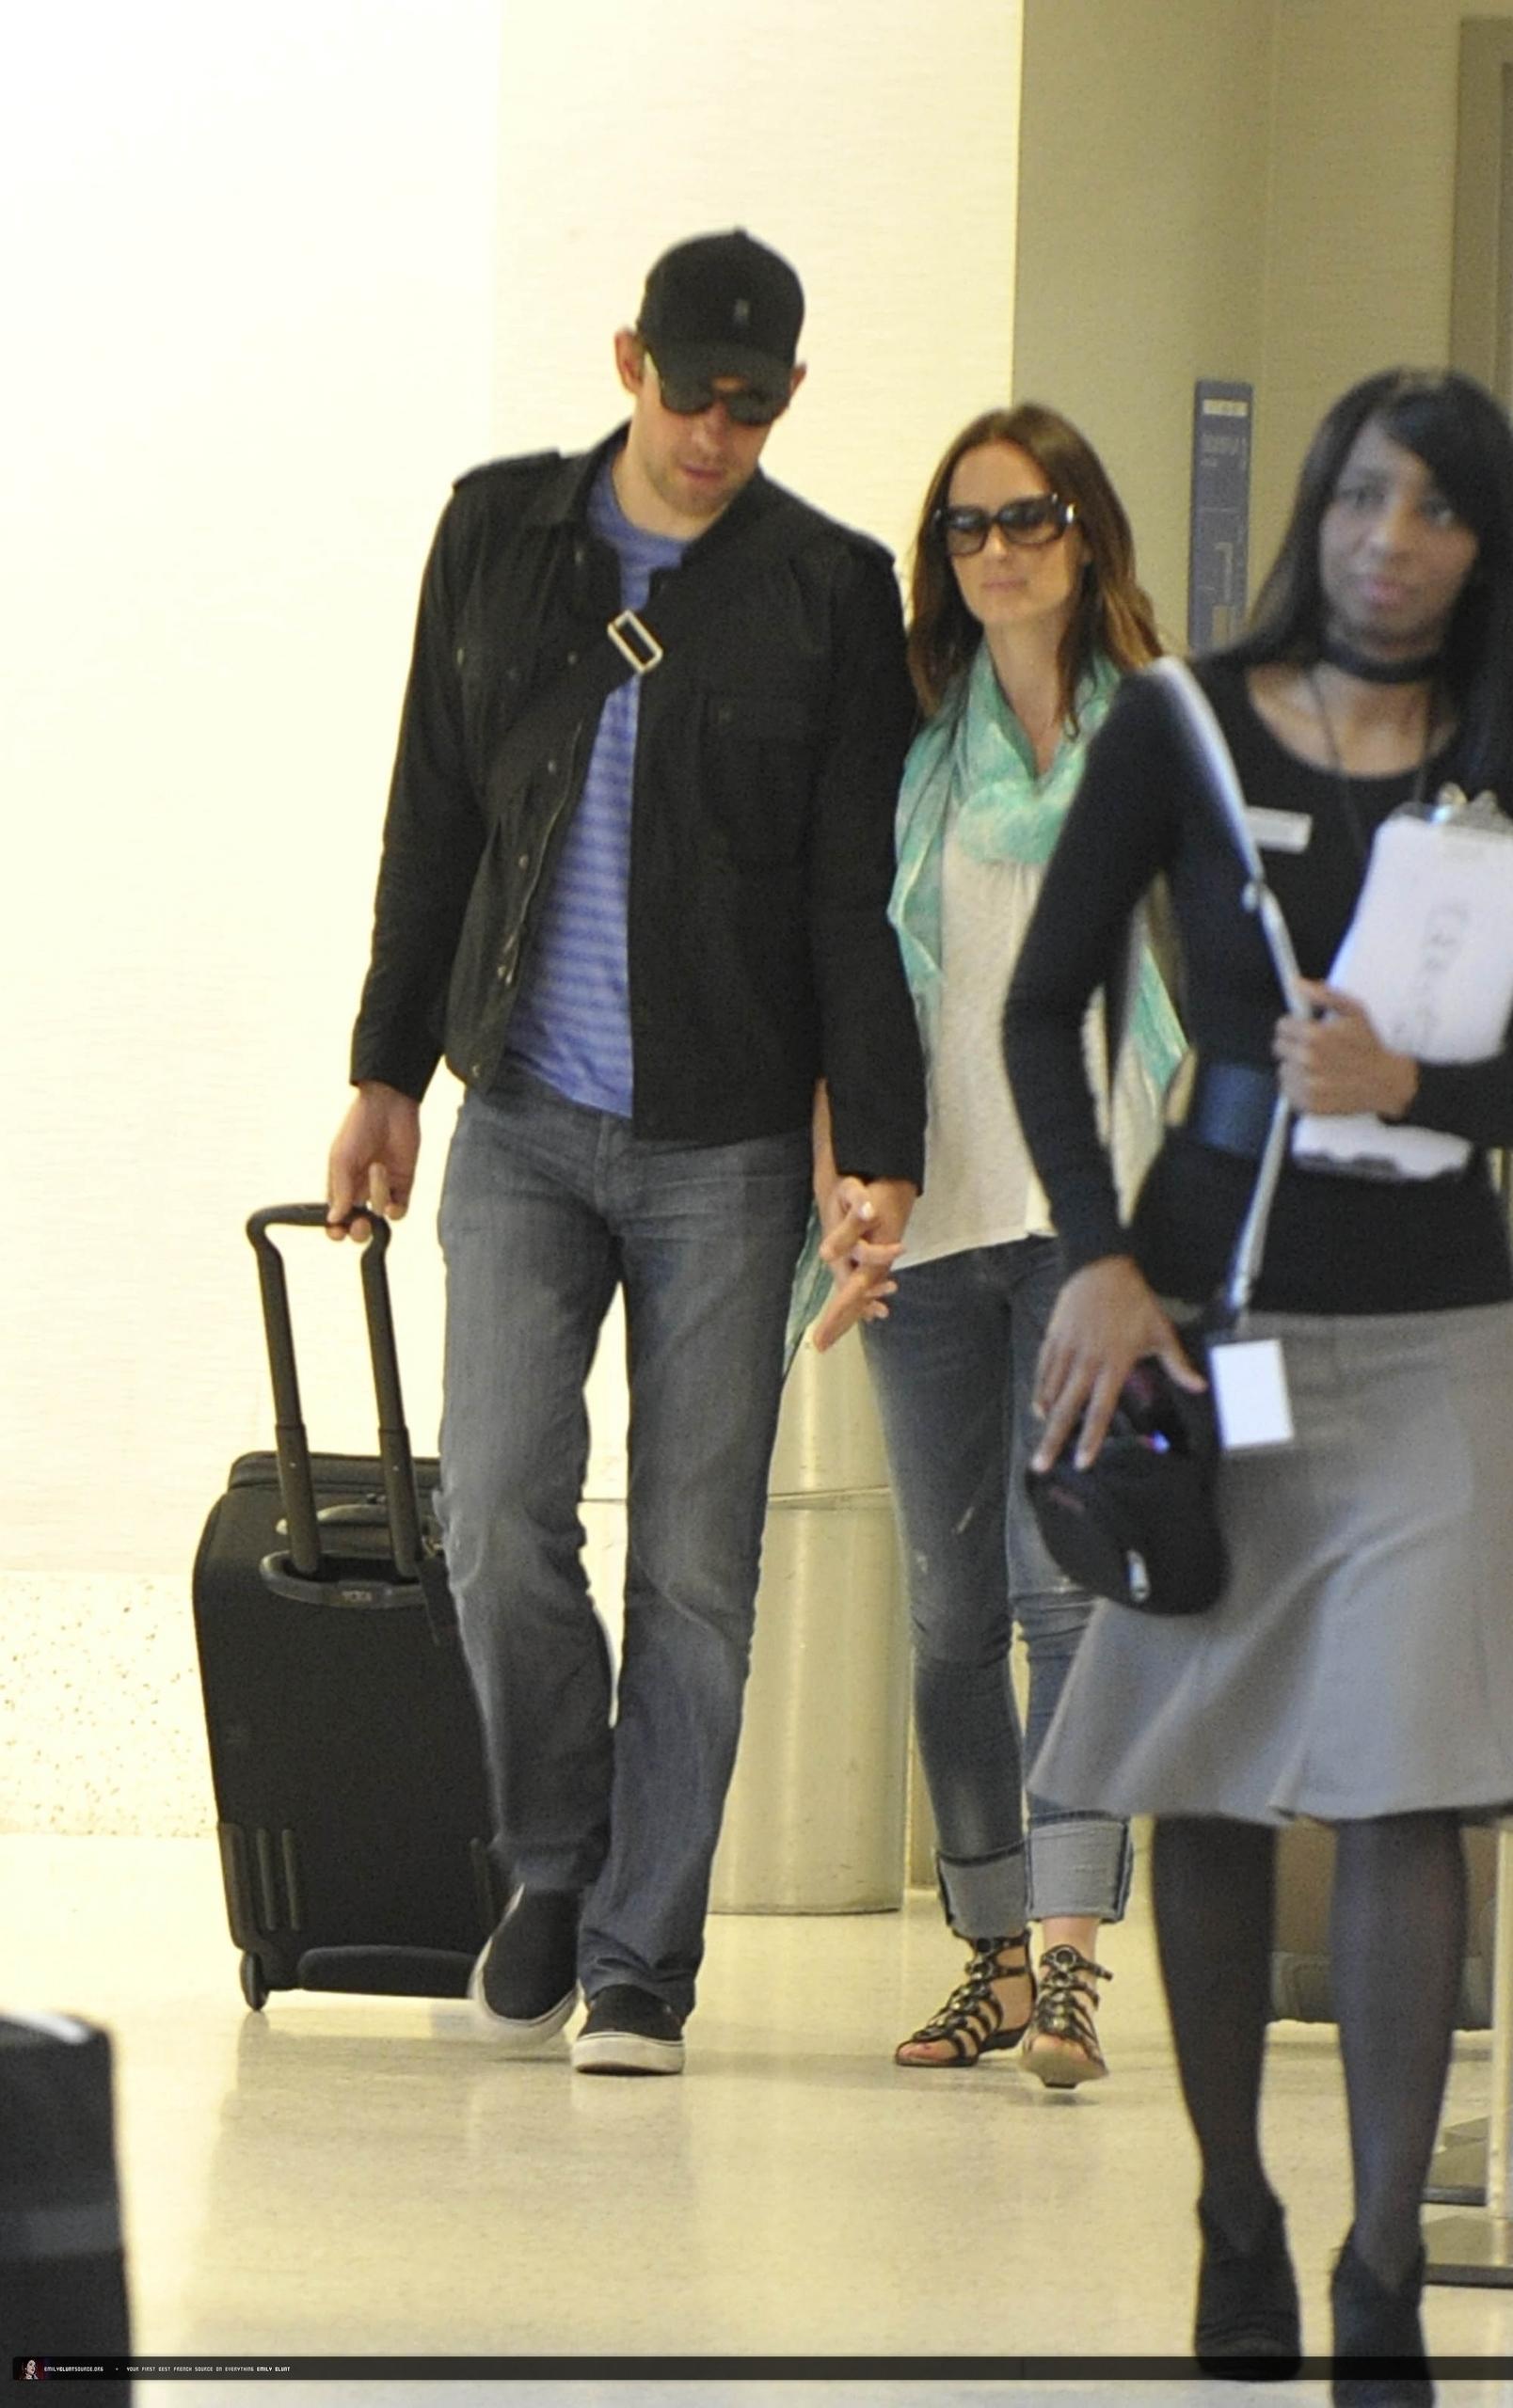 Emily Blunt and John Krasinski at LAX Airport (July 12)